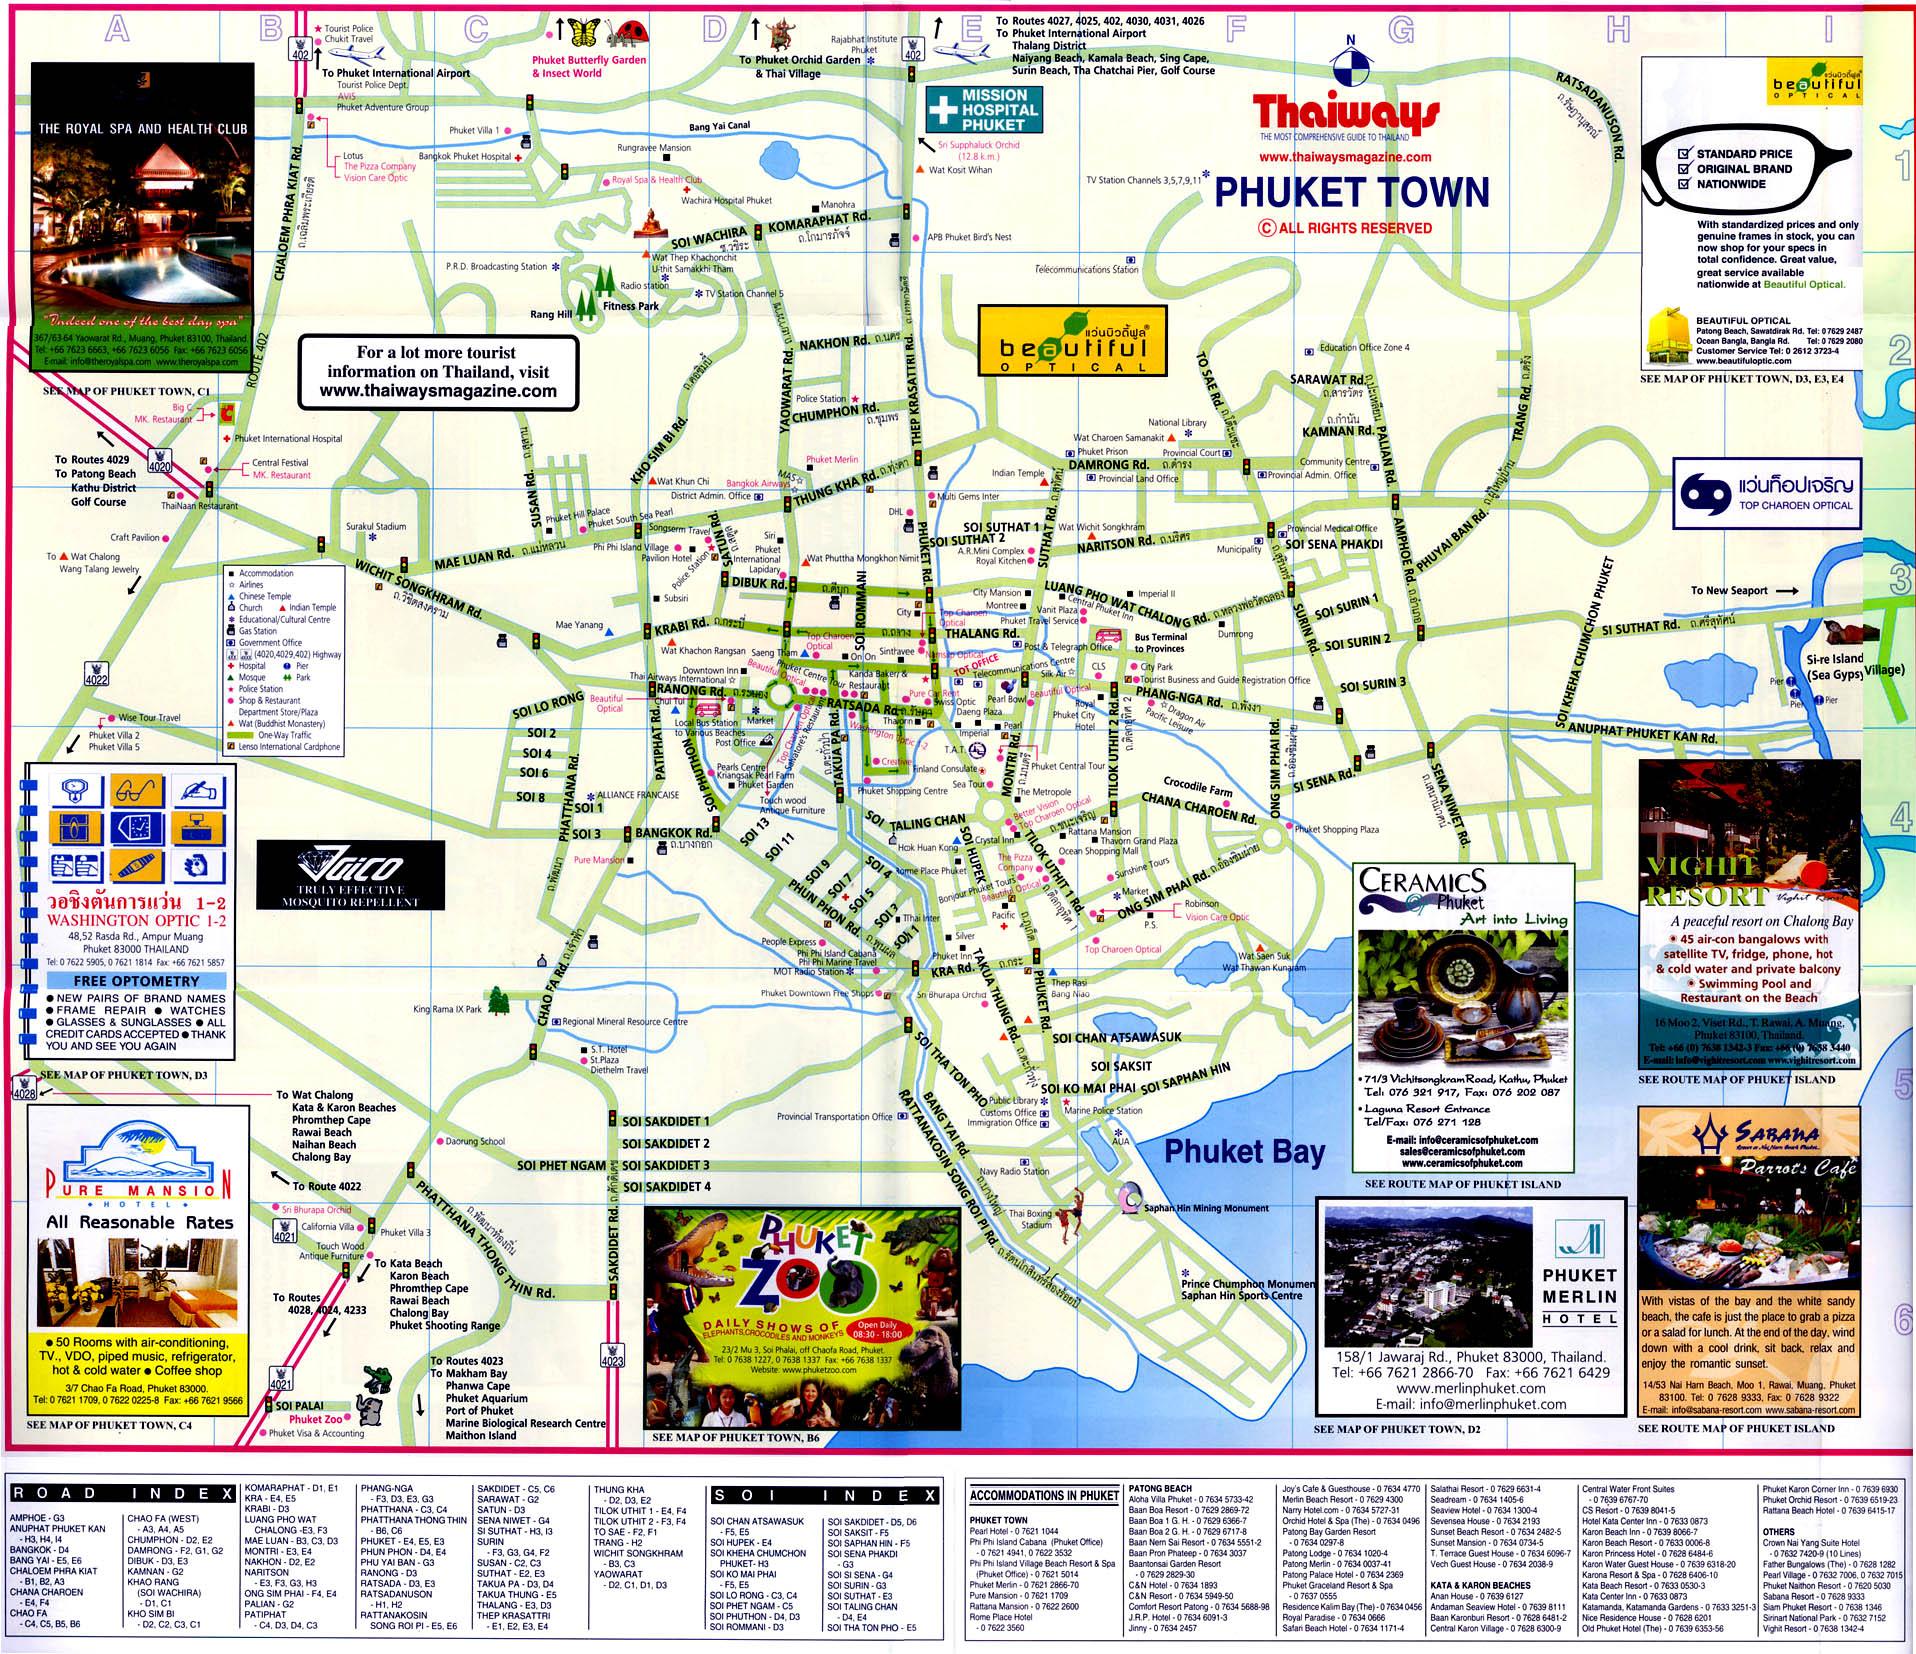 Phuket Town Map Phuket Thailand mappery